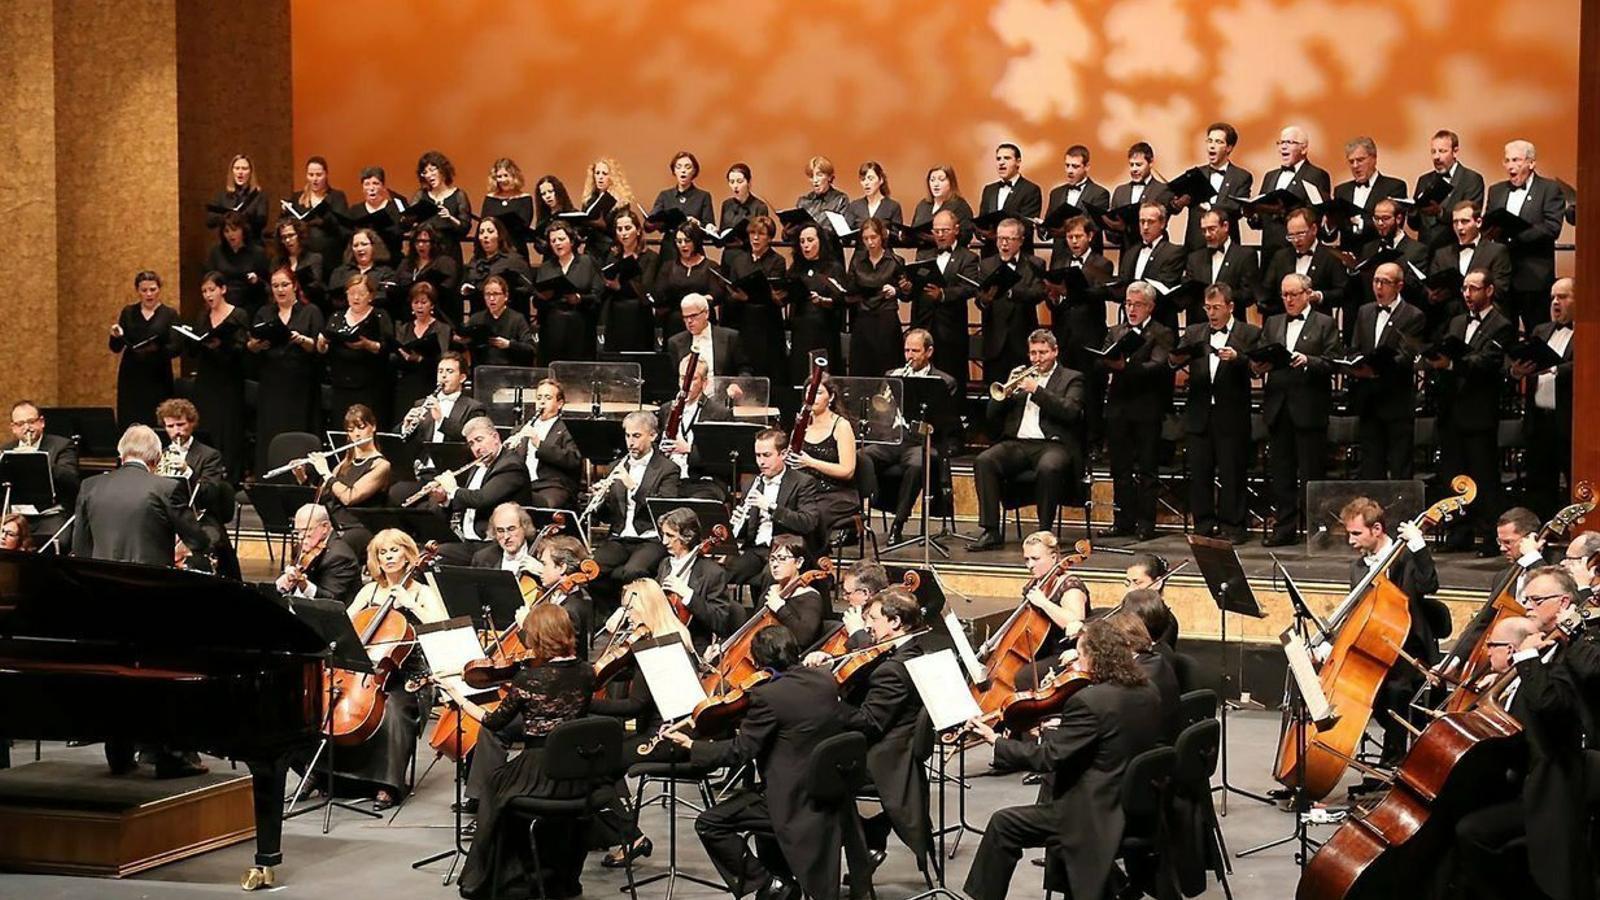 L'Orquestra Simfònica